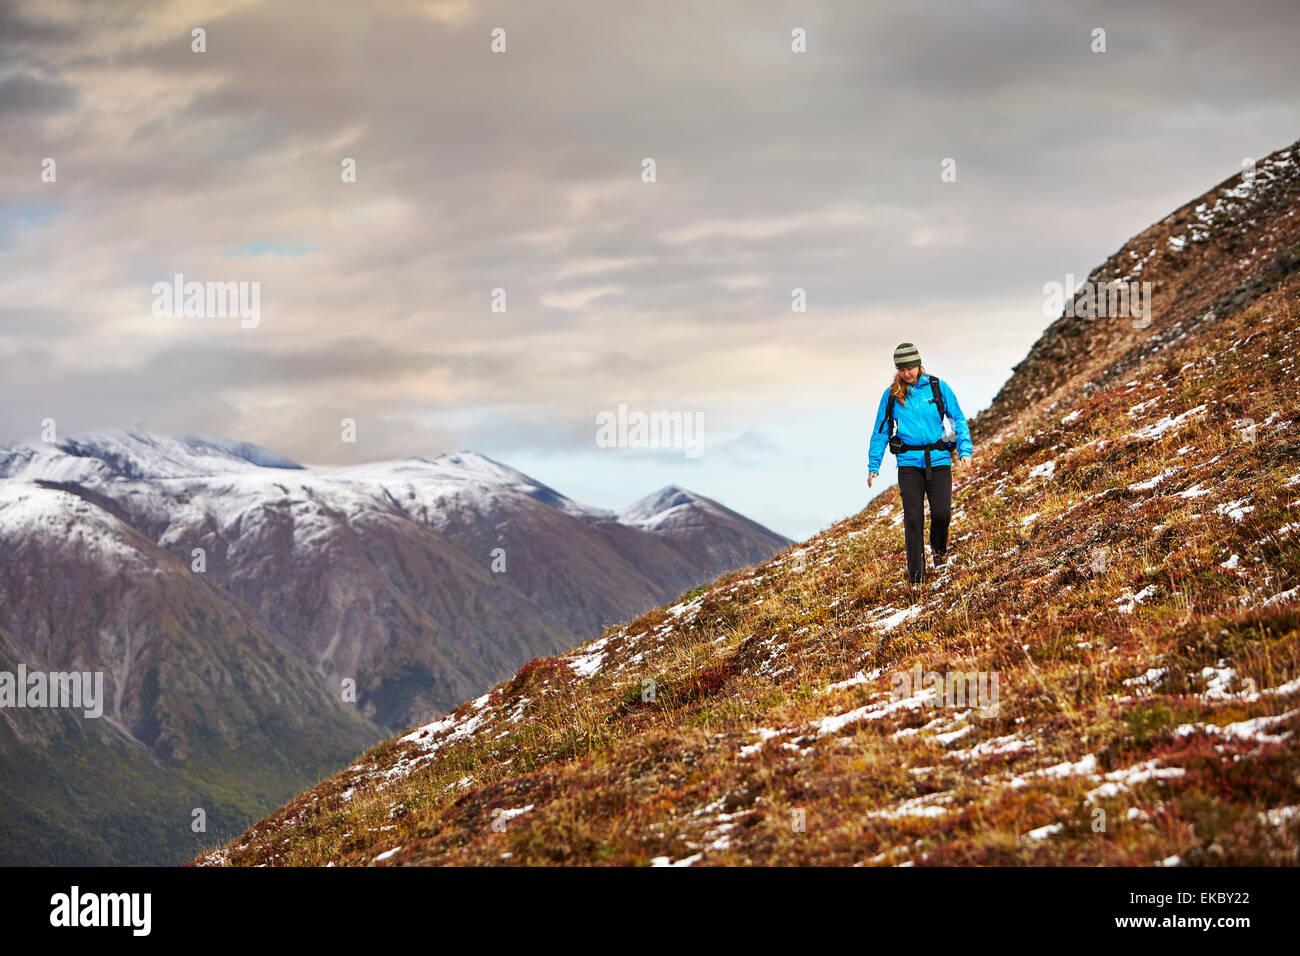 Female hiker randonnées sur la montagne escarpée, Wrangell St Elias, Alaska, USA Photo Stock